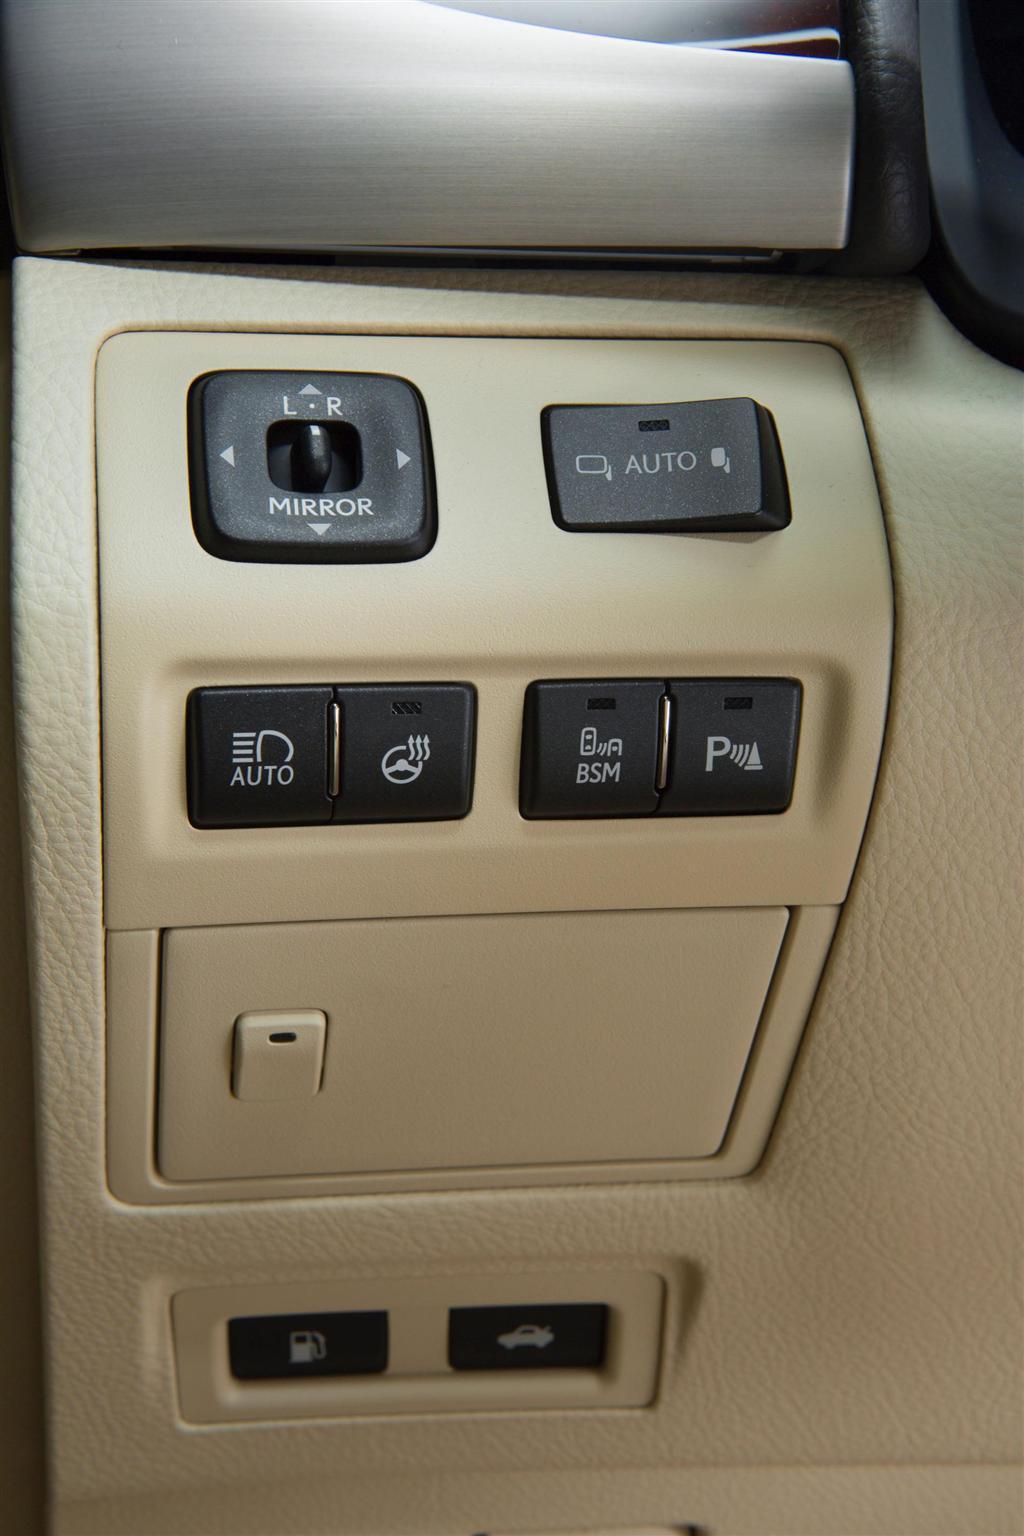 2013 Lexus Ls 460 Image Httpswwwconceptcarzcom